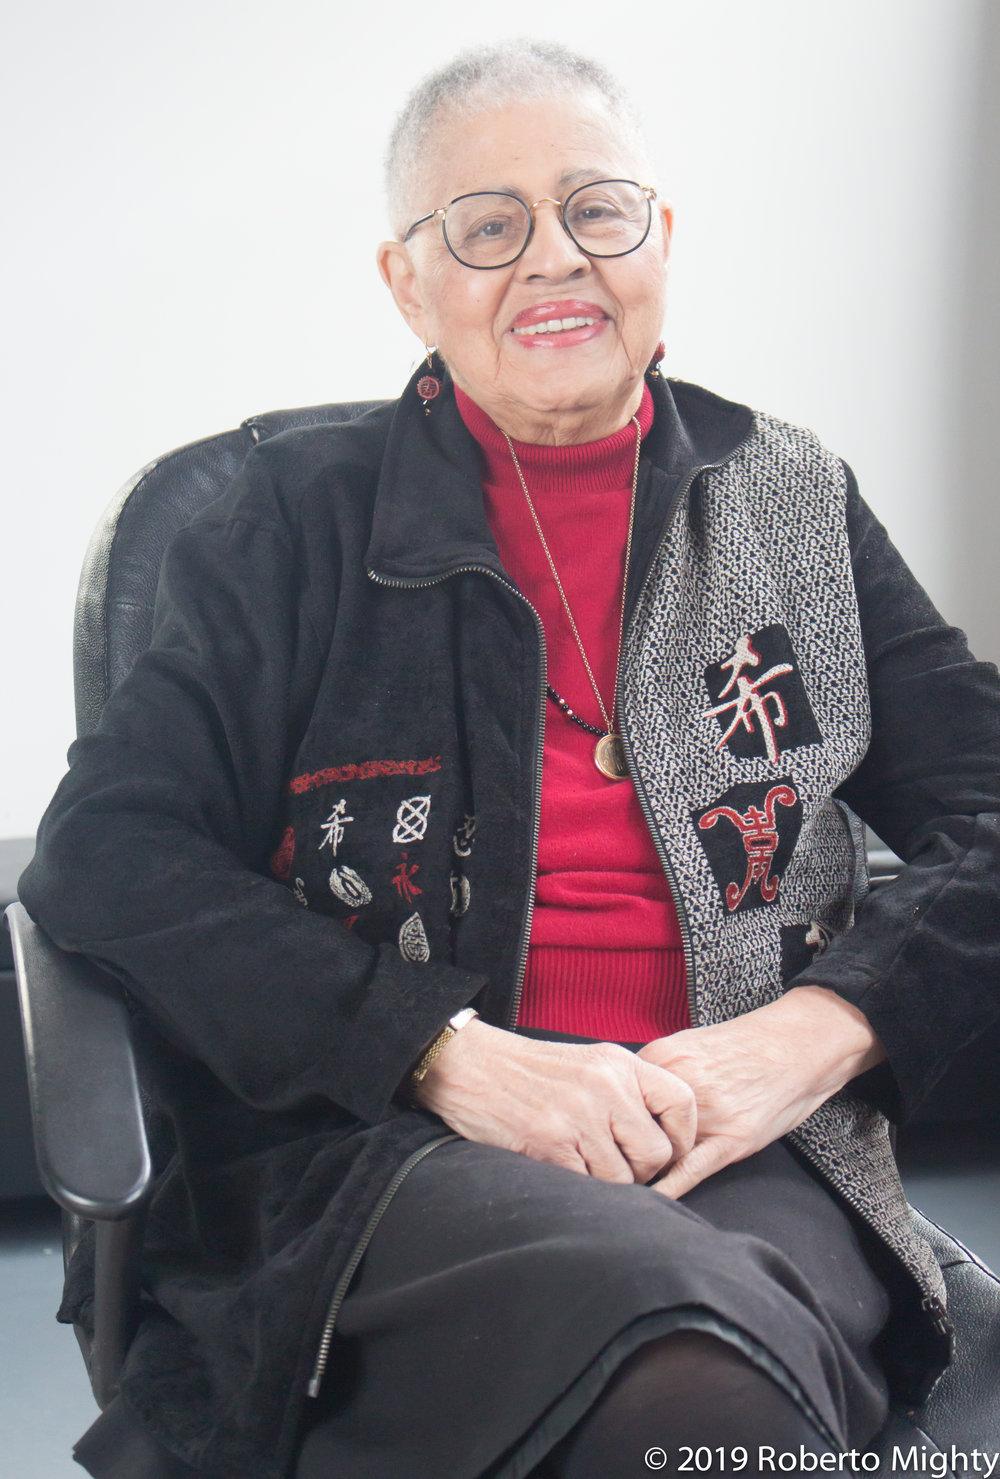 Sarah-Ann Shaw